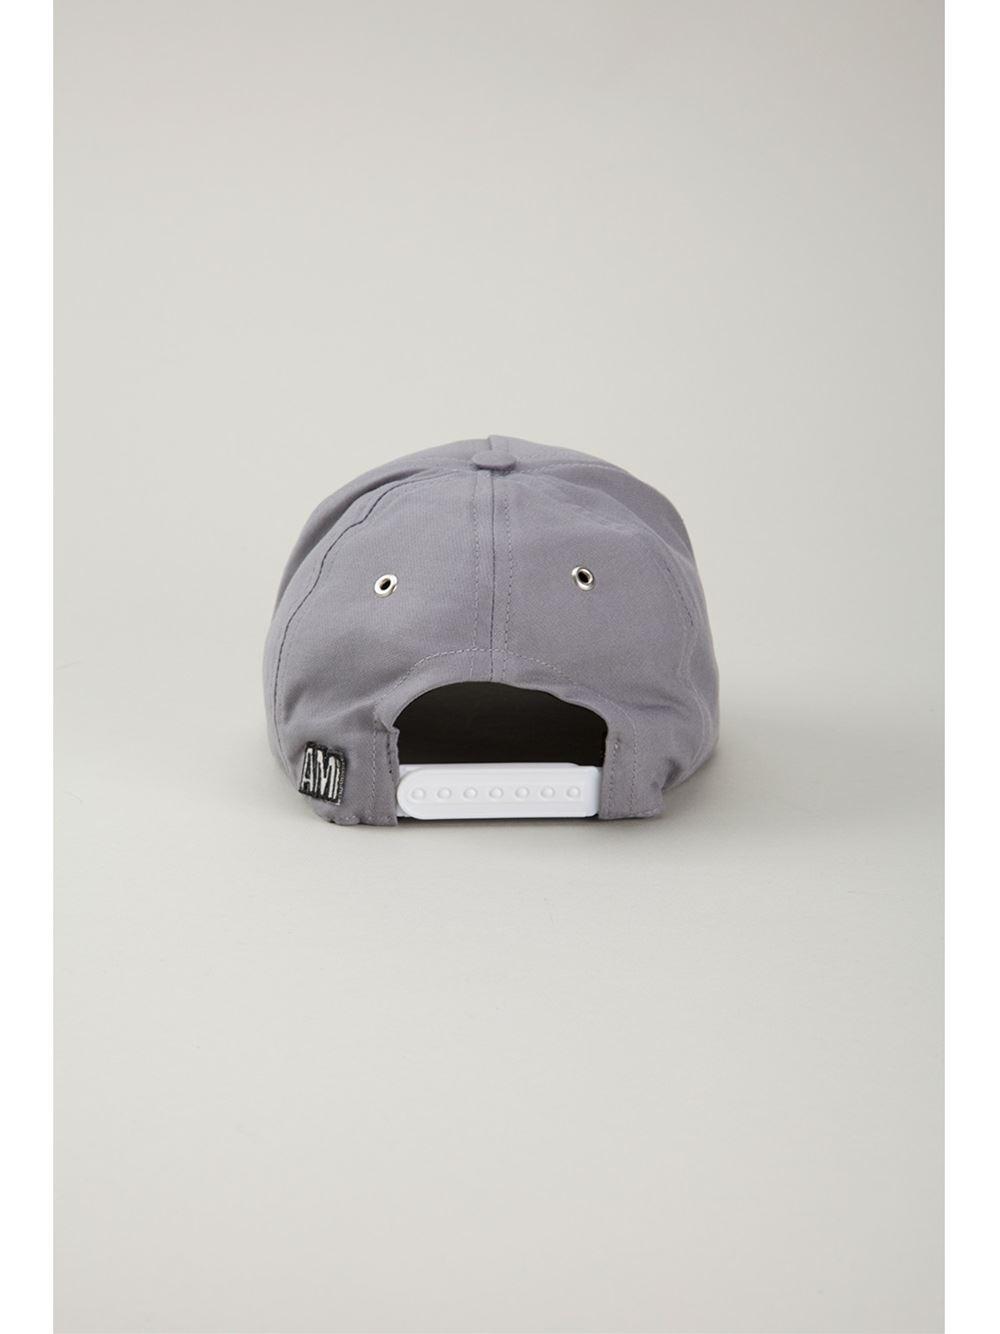 16a3e87ff9abb Gallery. Previously sold at  Farfetch · Men s Baseball Caps